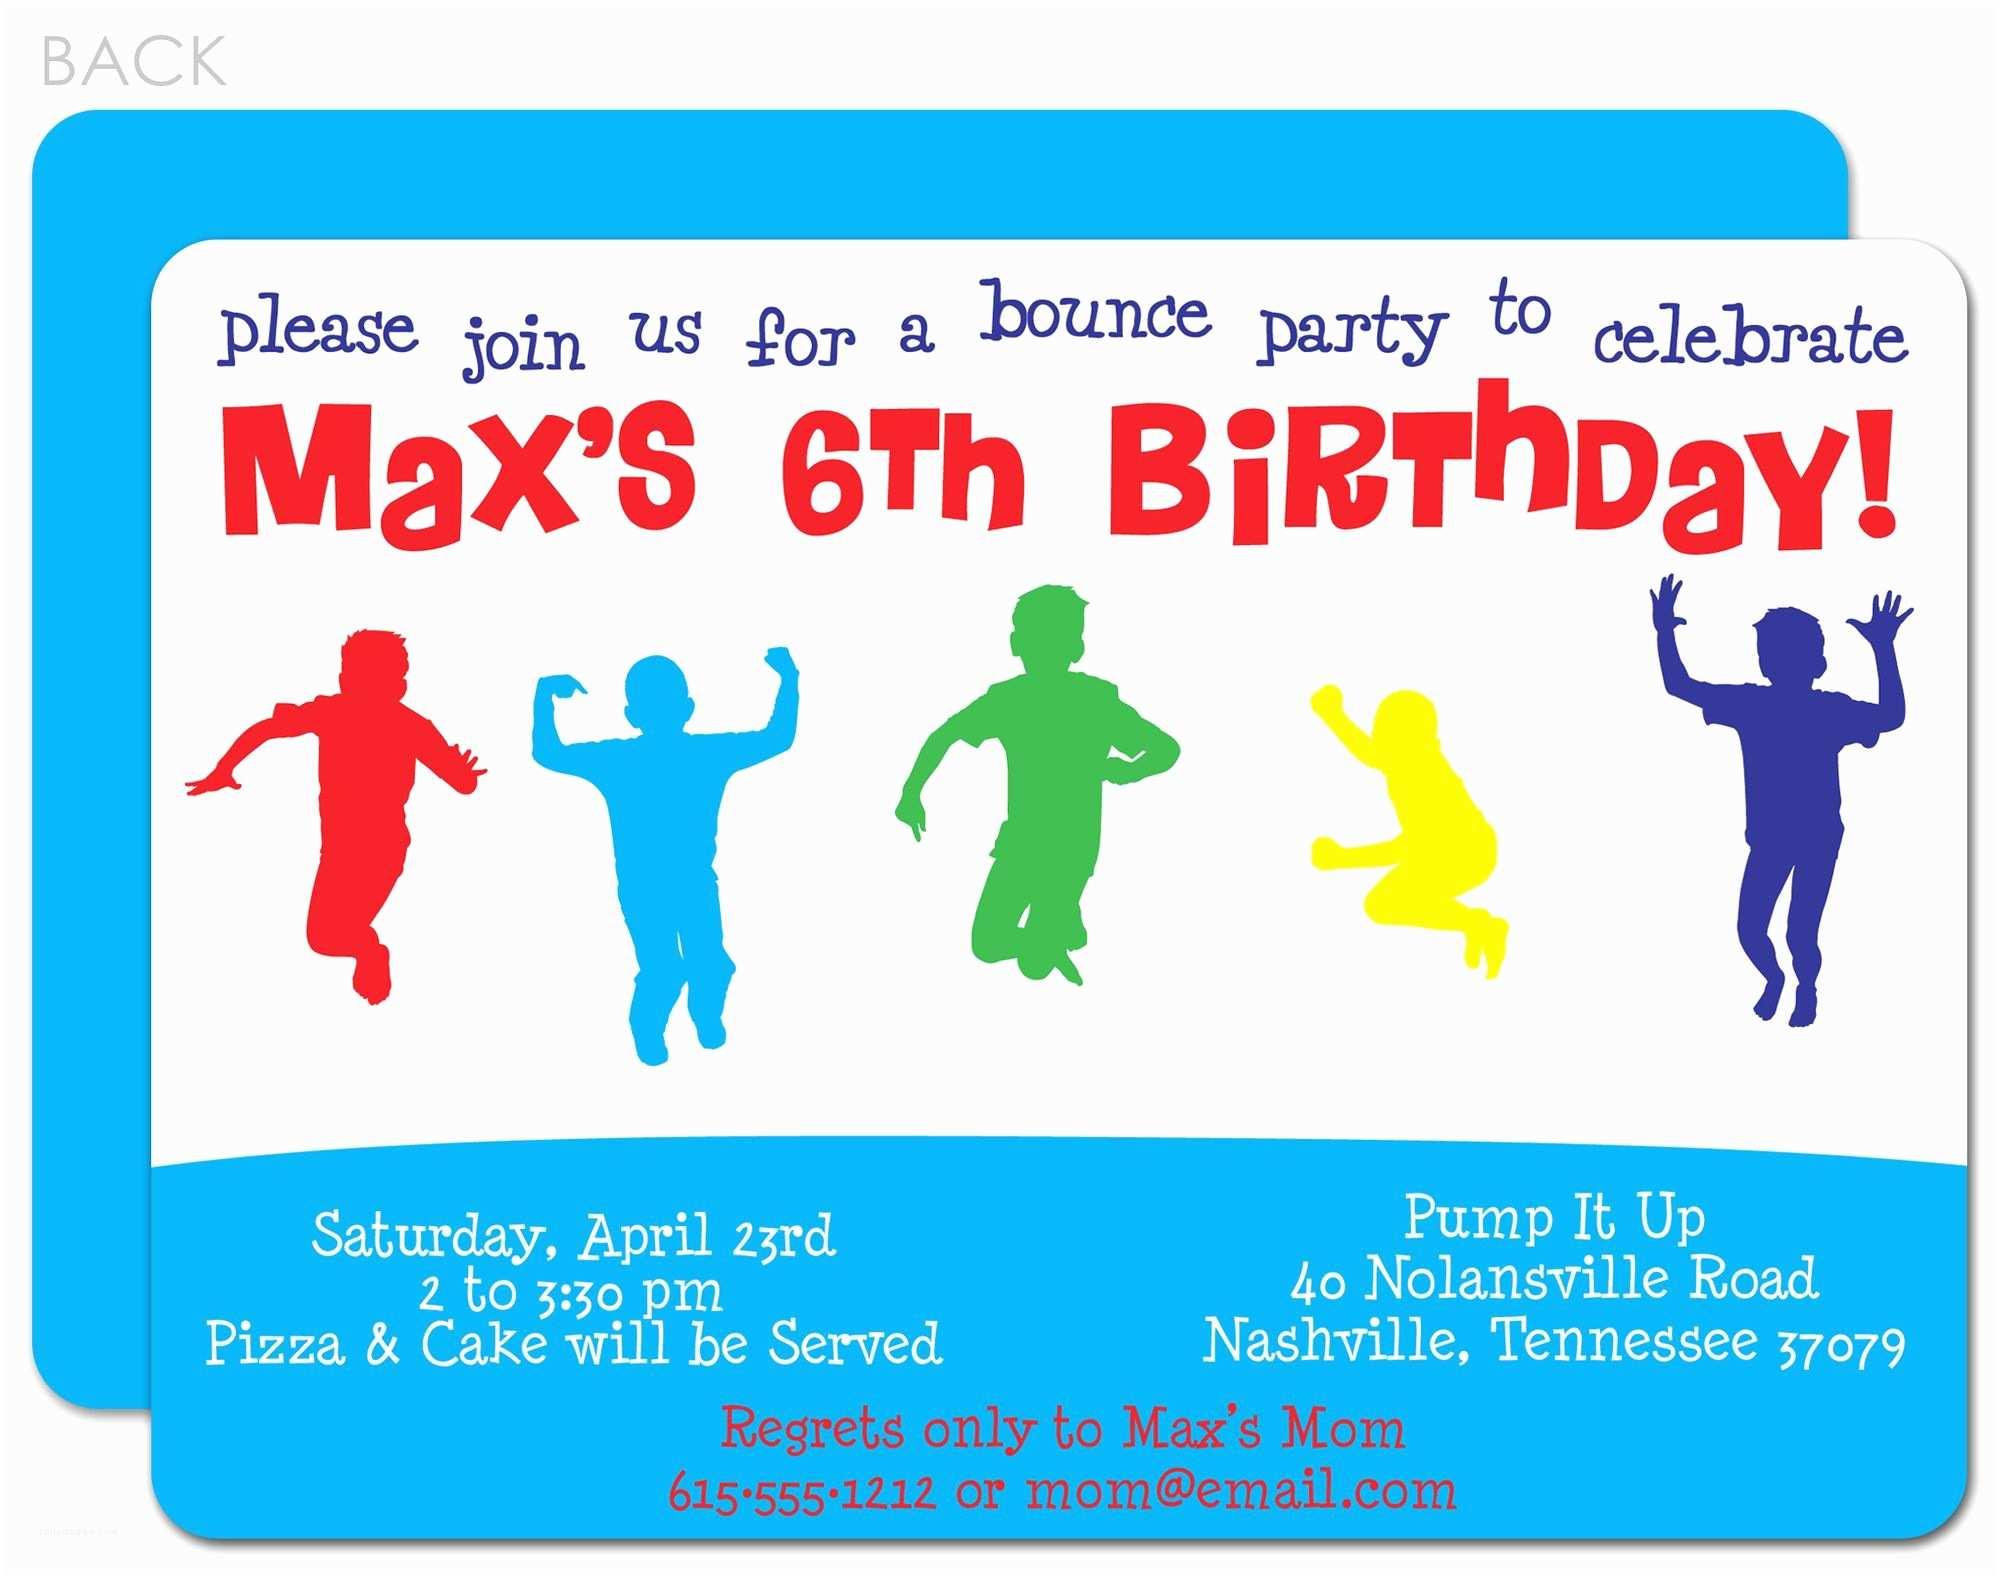 Birthday Party Invitation Text Birthday Invitation Via Sms Gallery Invitation Sample